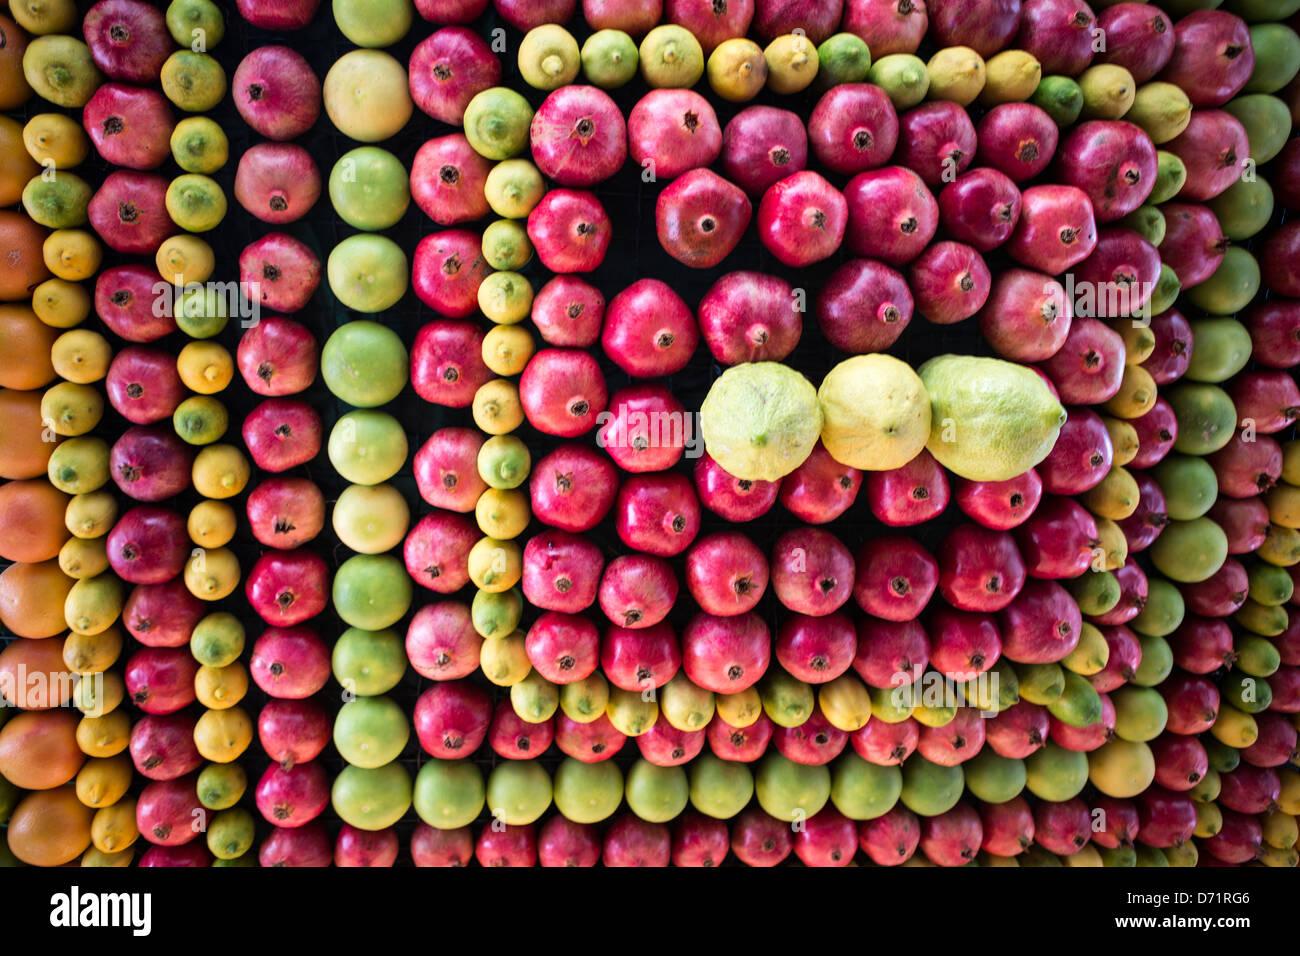 Sukkot festive celebration of the Samaritan religious community - Stock Image